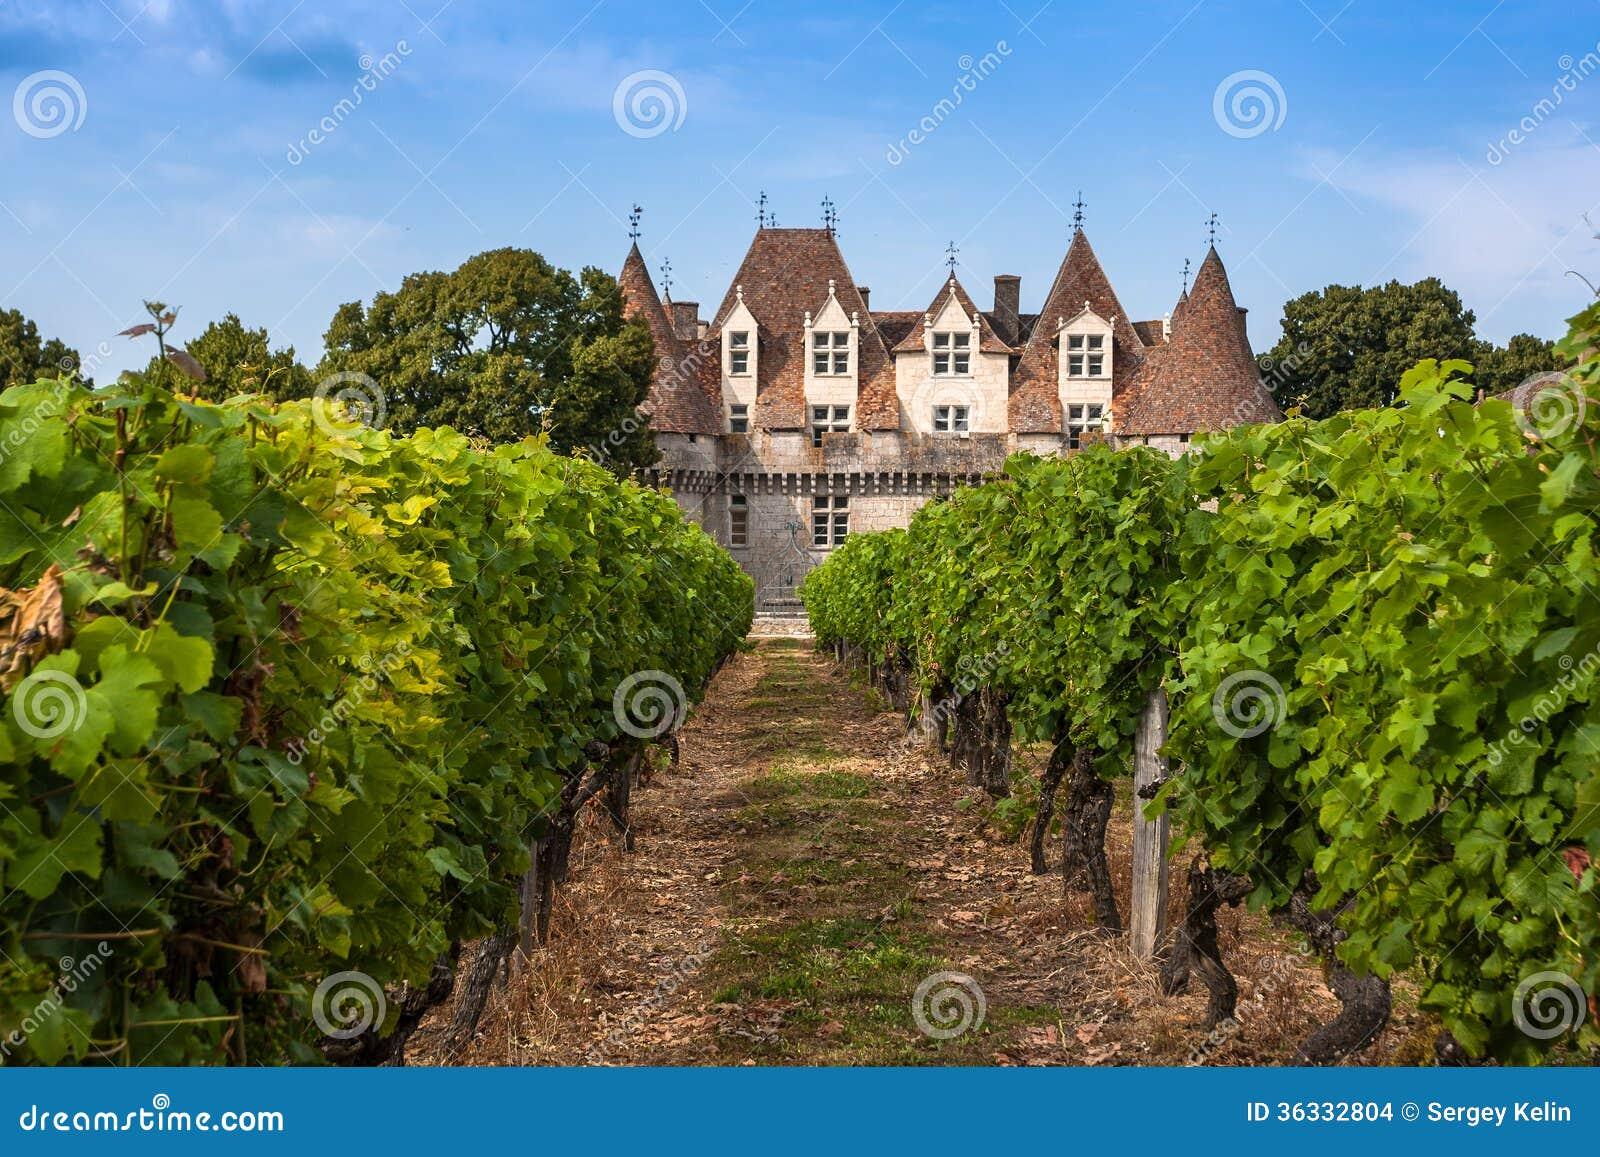 Monbazillac Castle με τον αμπελώνα, Aquitaine, Γαλλία